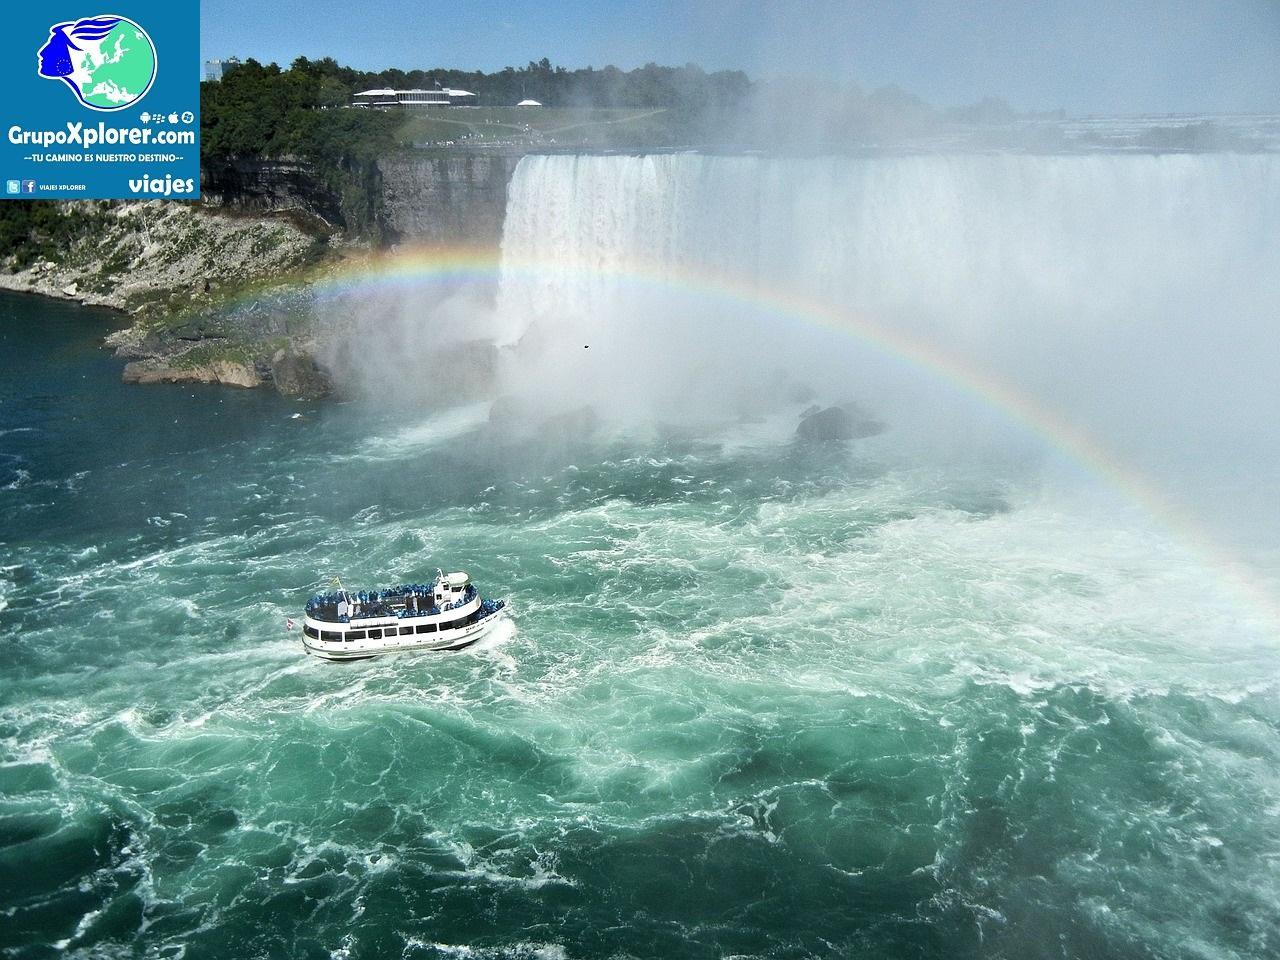 niagara-falls-599320_1280